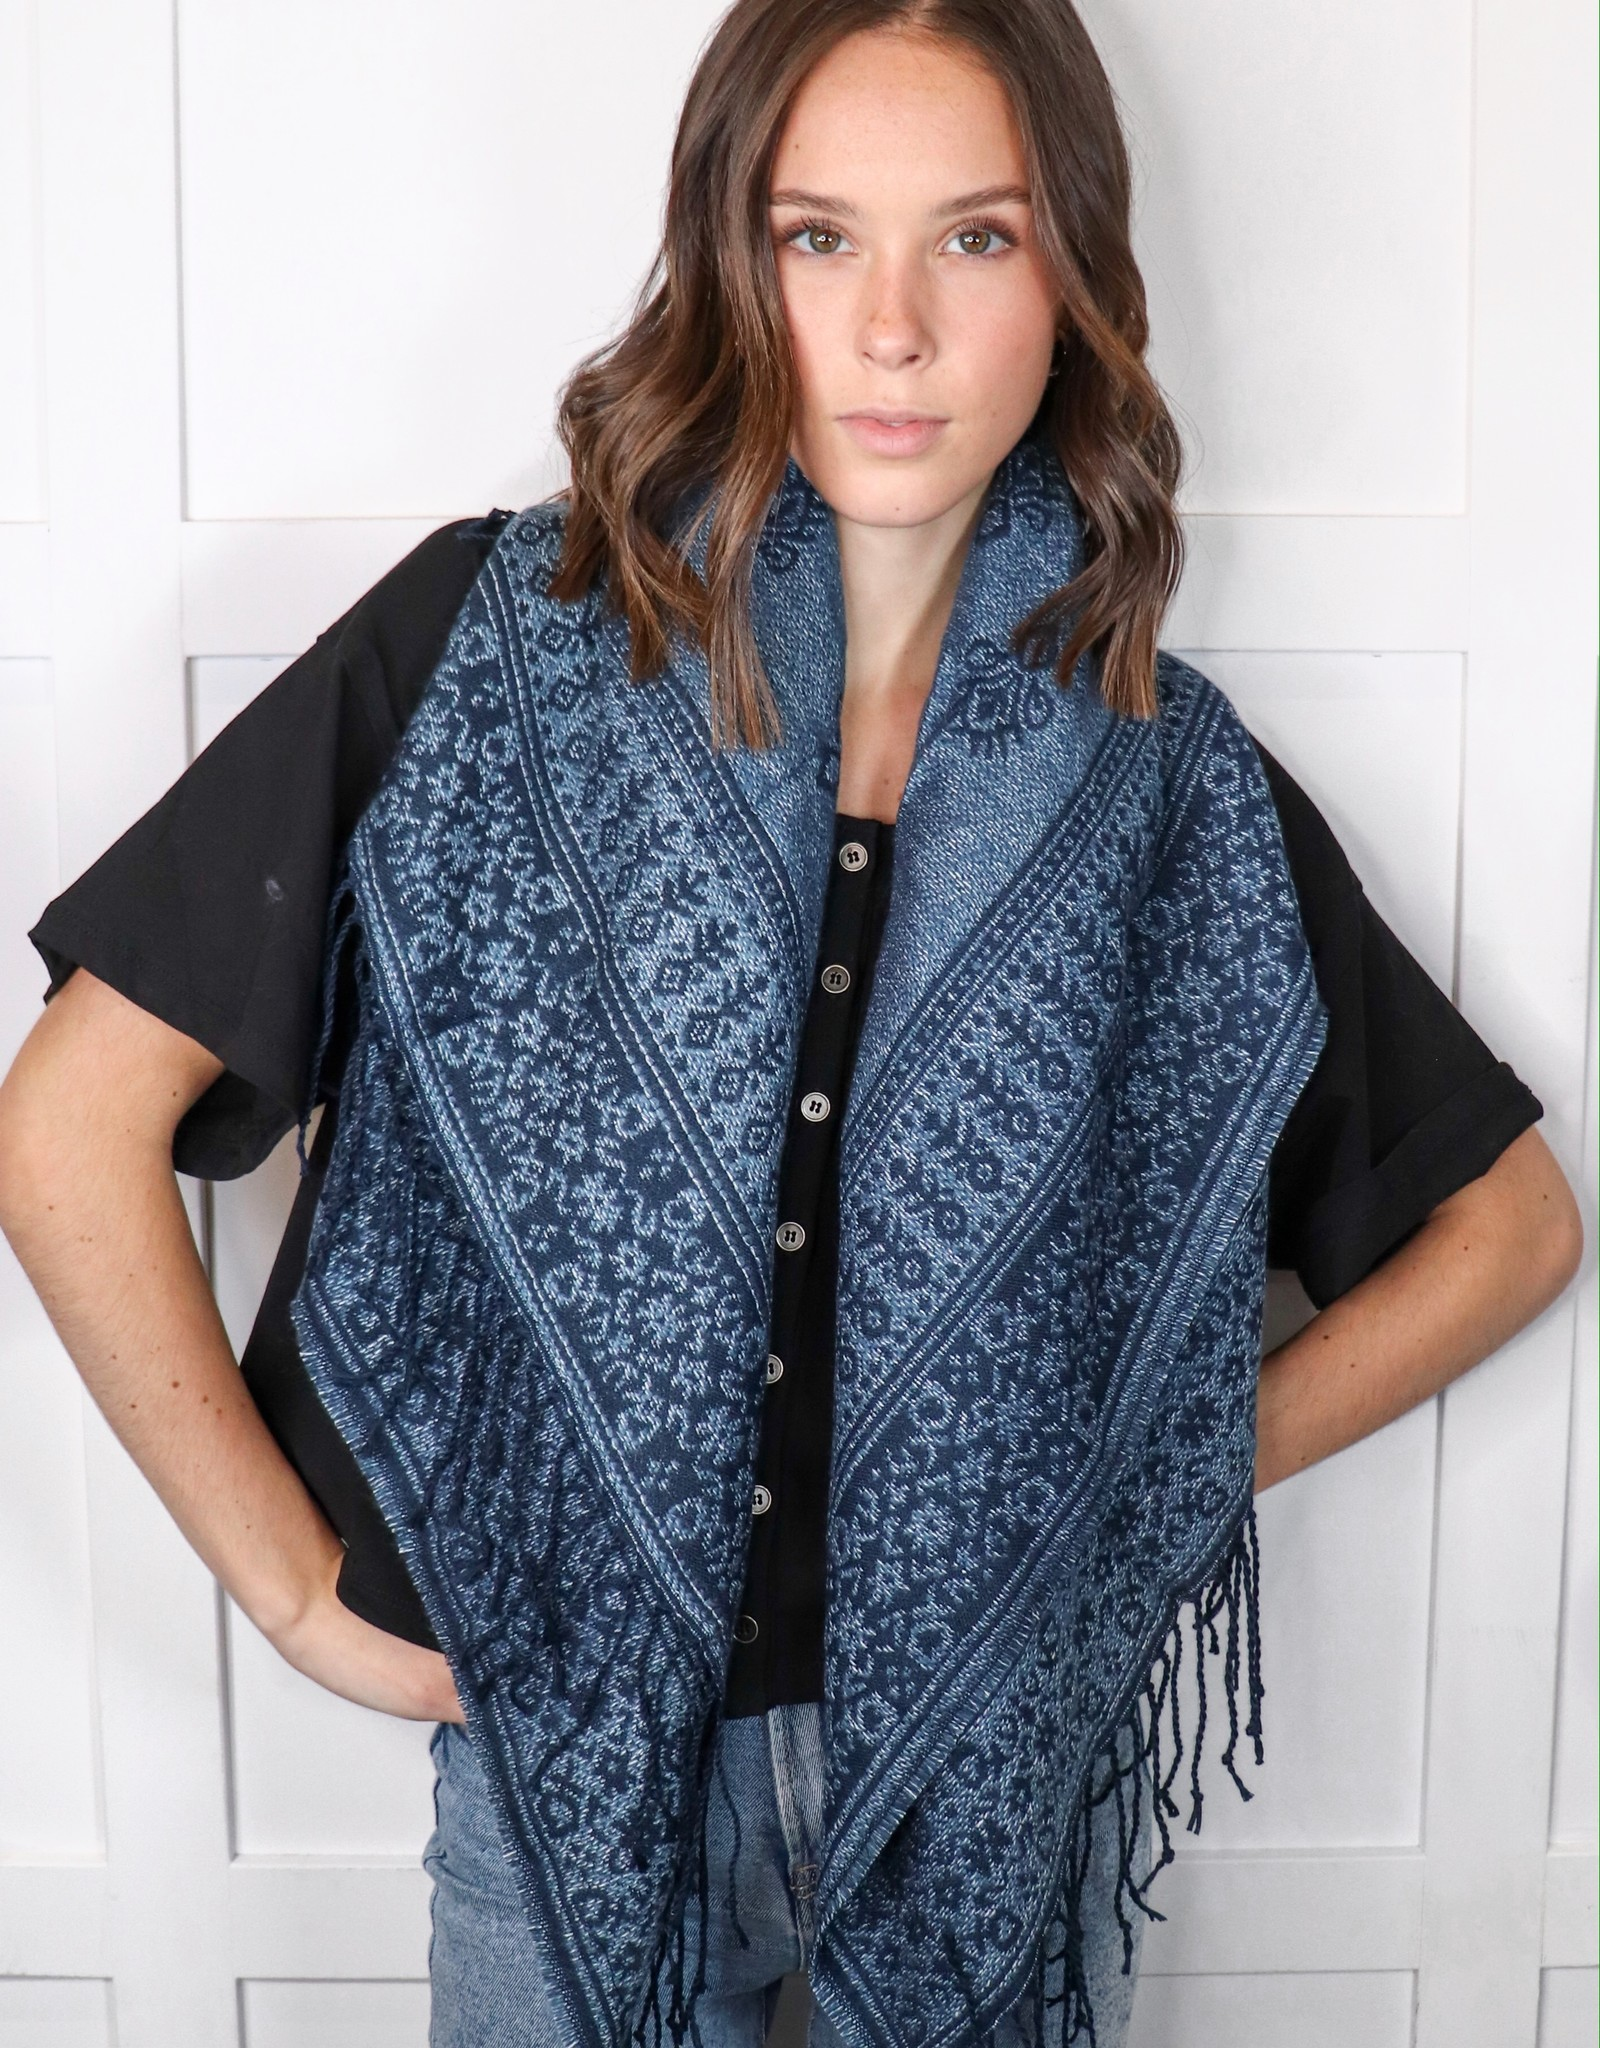 HUSH Moroccan border blanket scarf